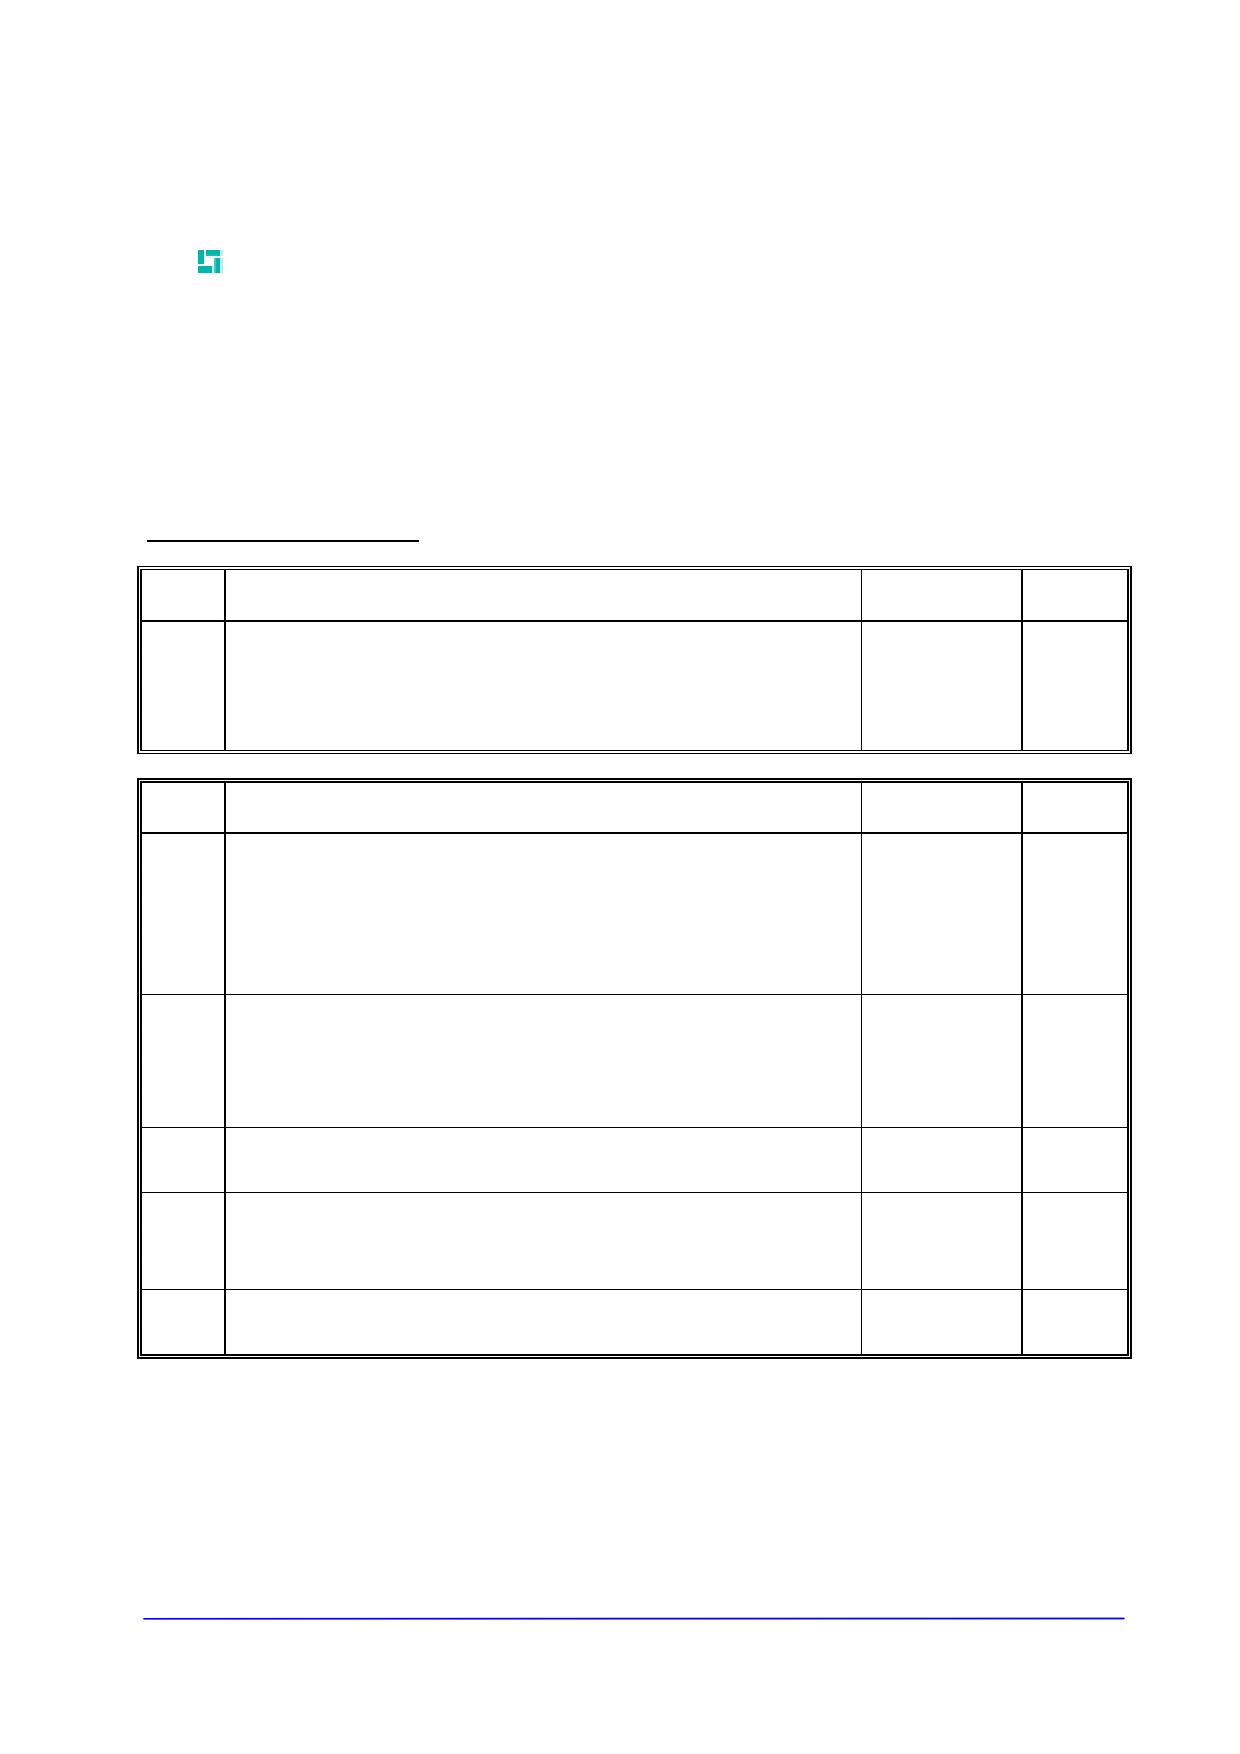 R0487YS12E datasheet